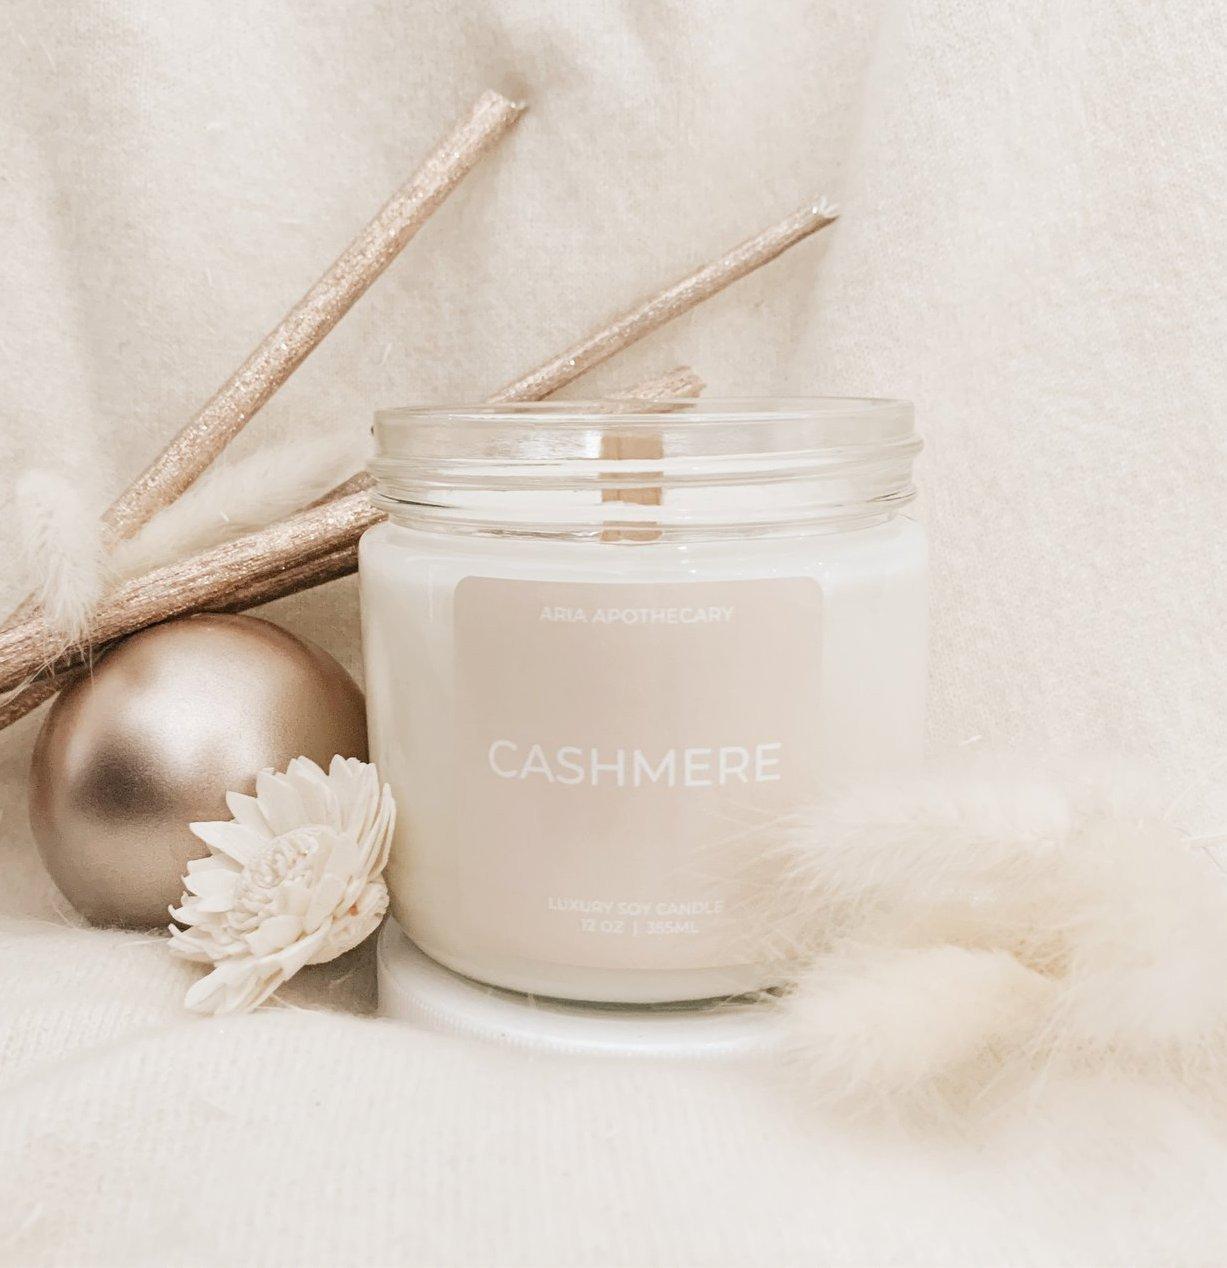 Cashmere Bergamot, White Jasmine  and Patchouli * Wooden Wick